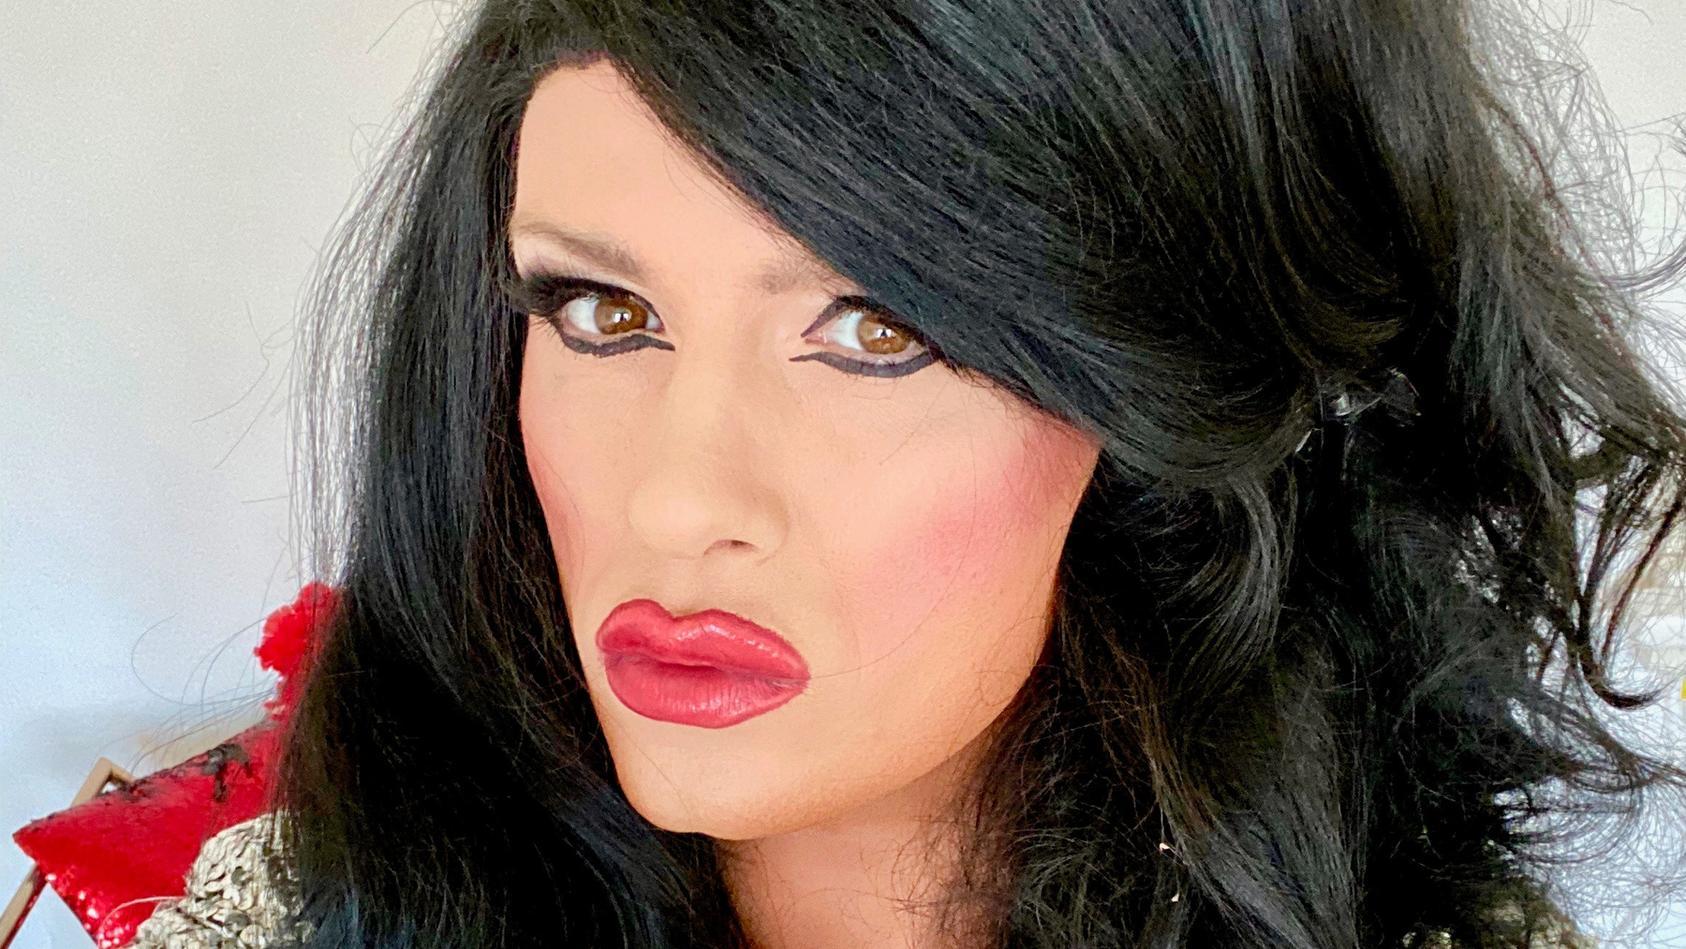 Nina Queer wird nicht an der Dschungelshow 2021 teilnehmen